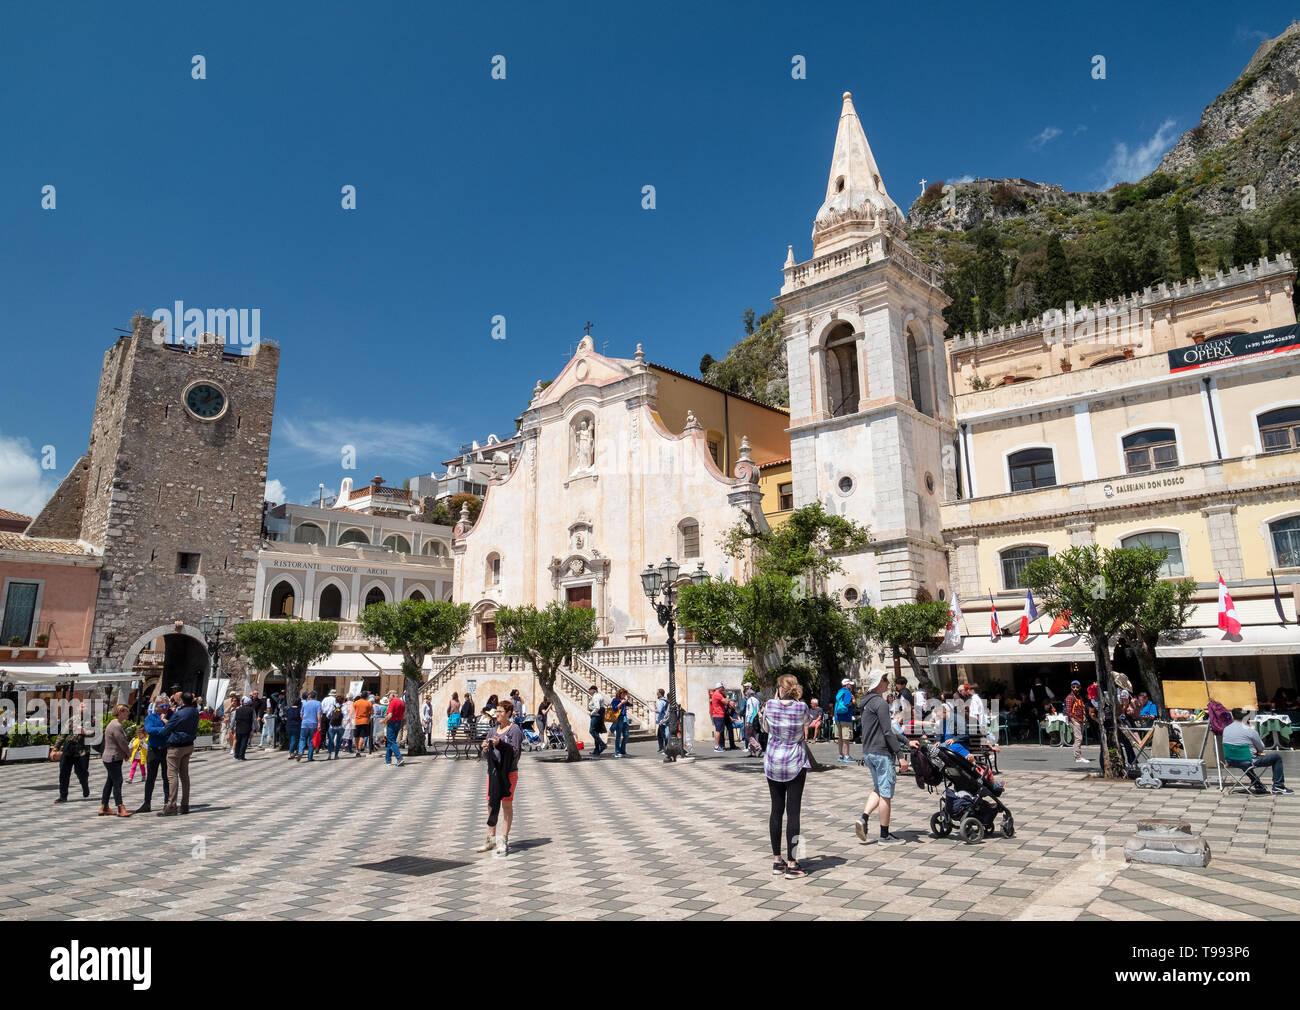 Borgo clock tower and San Giuseppe Church at IX Aprile Square, Corso Umberto, Taormina village, Sicily - Stock Image